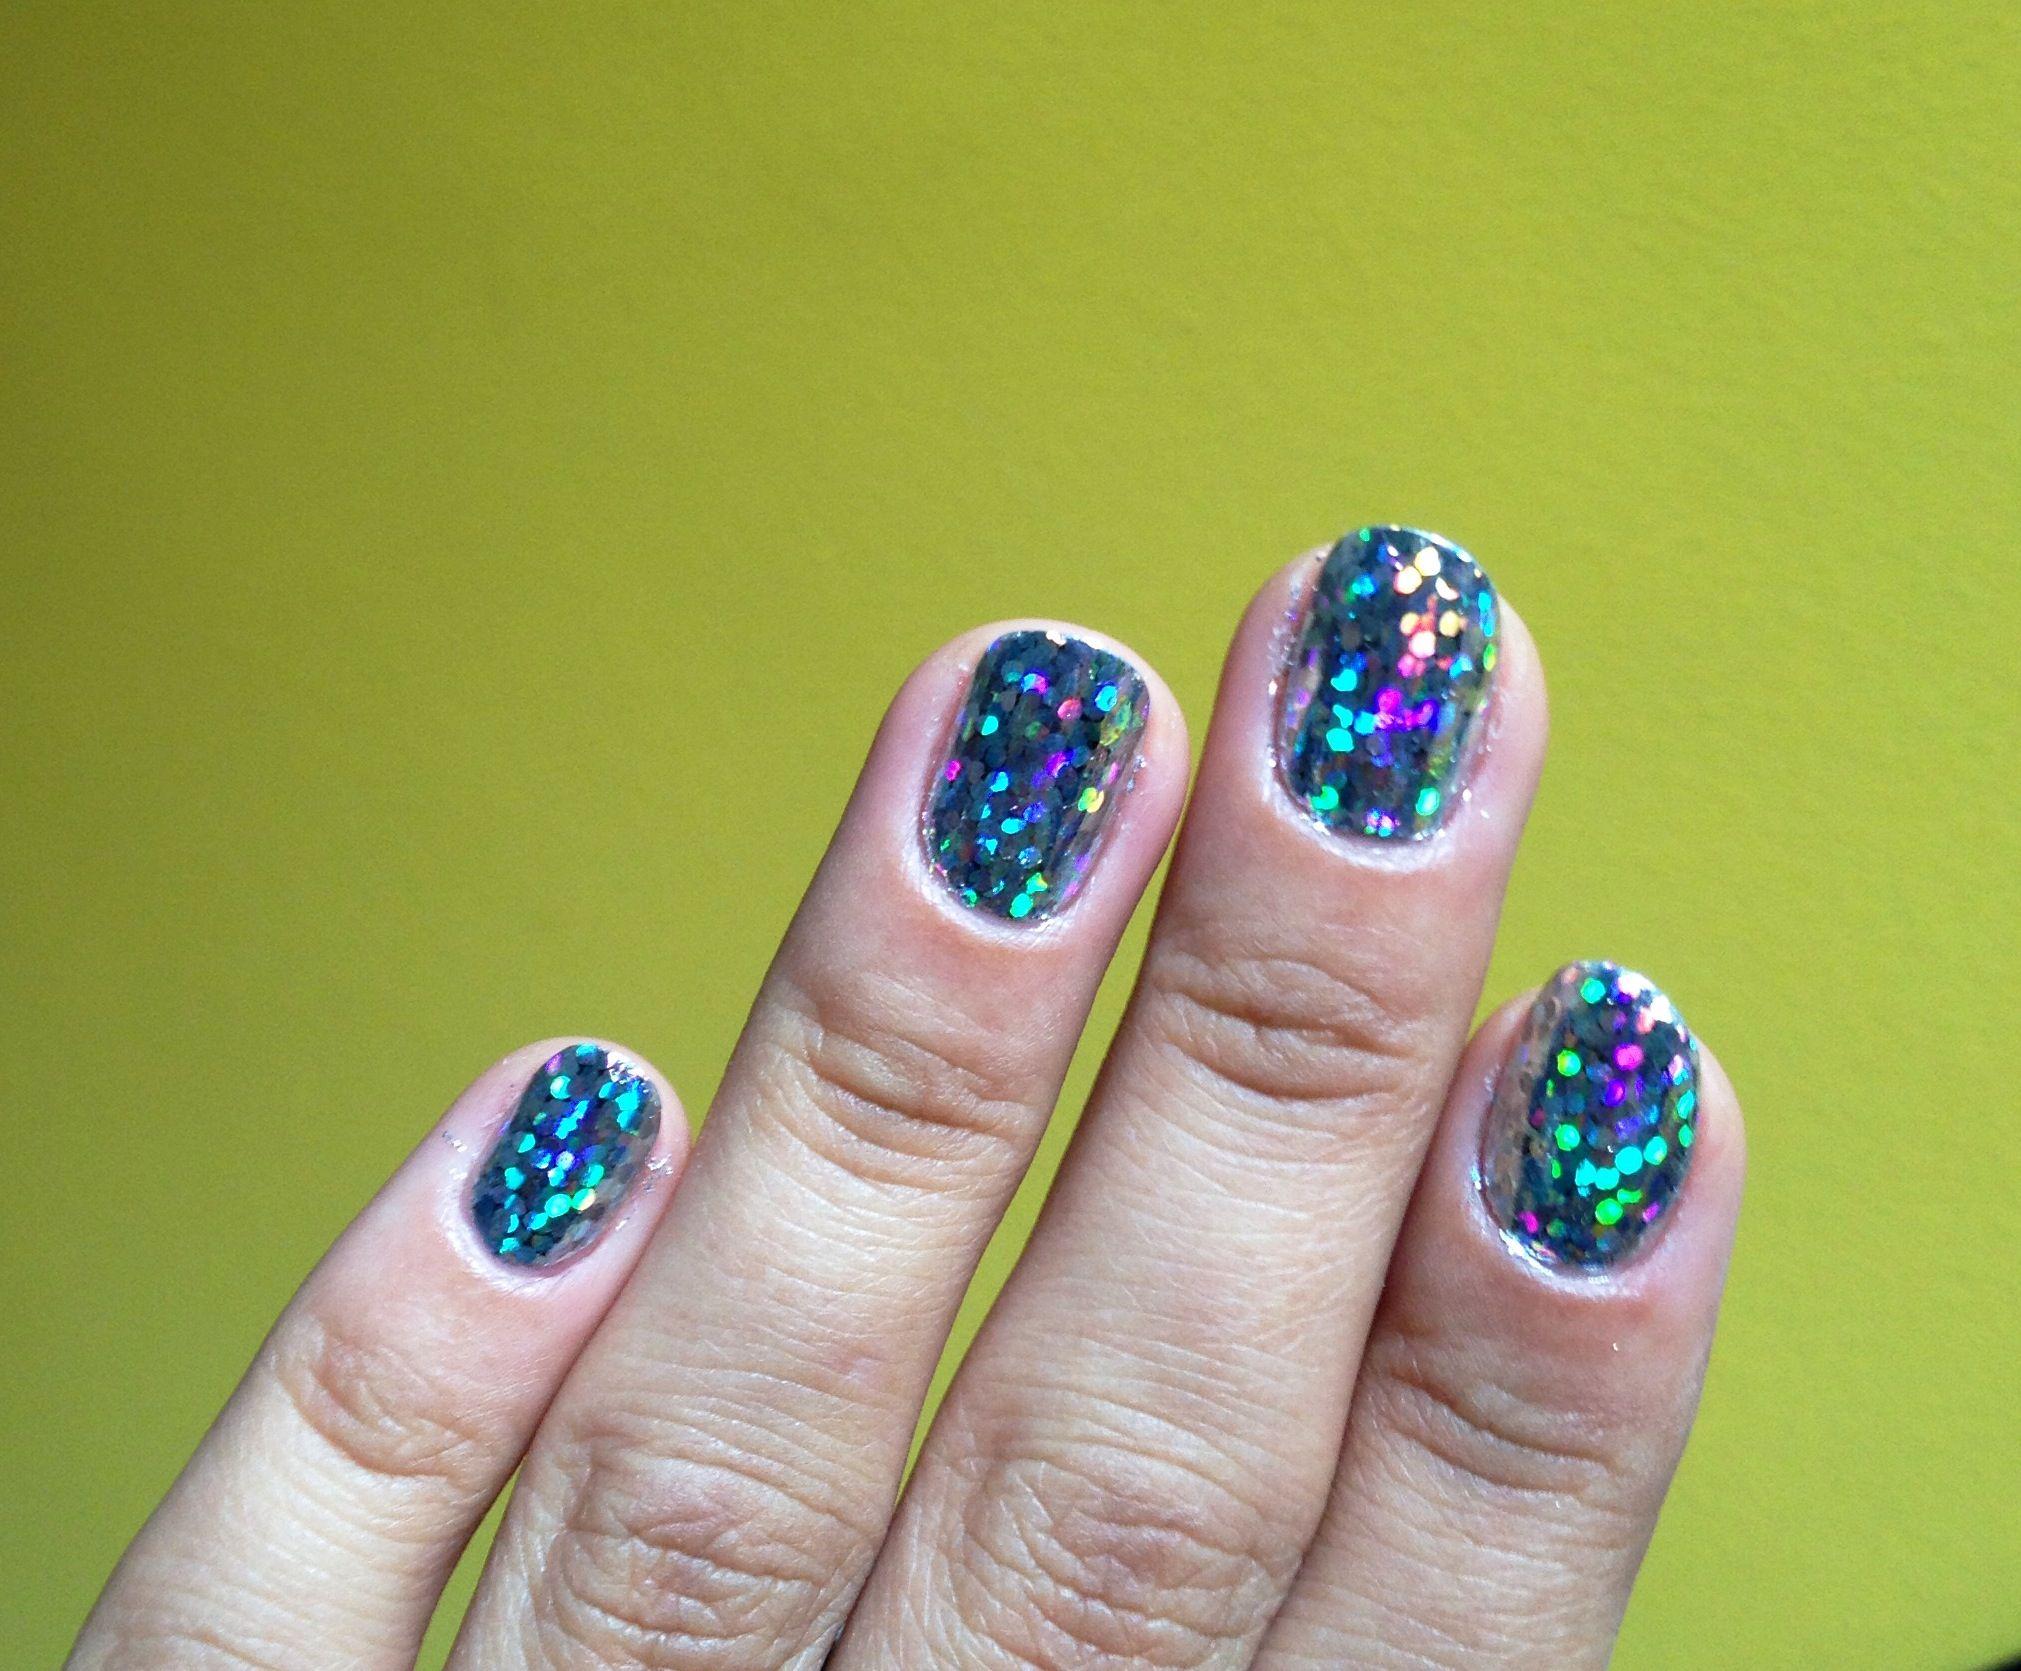 Nails nail foil holo hologram confetti silver colors disco ball ...